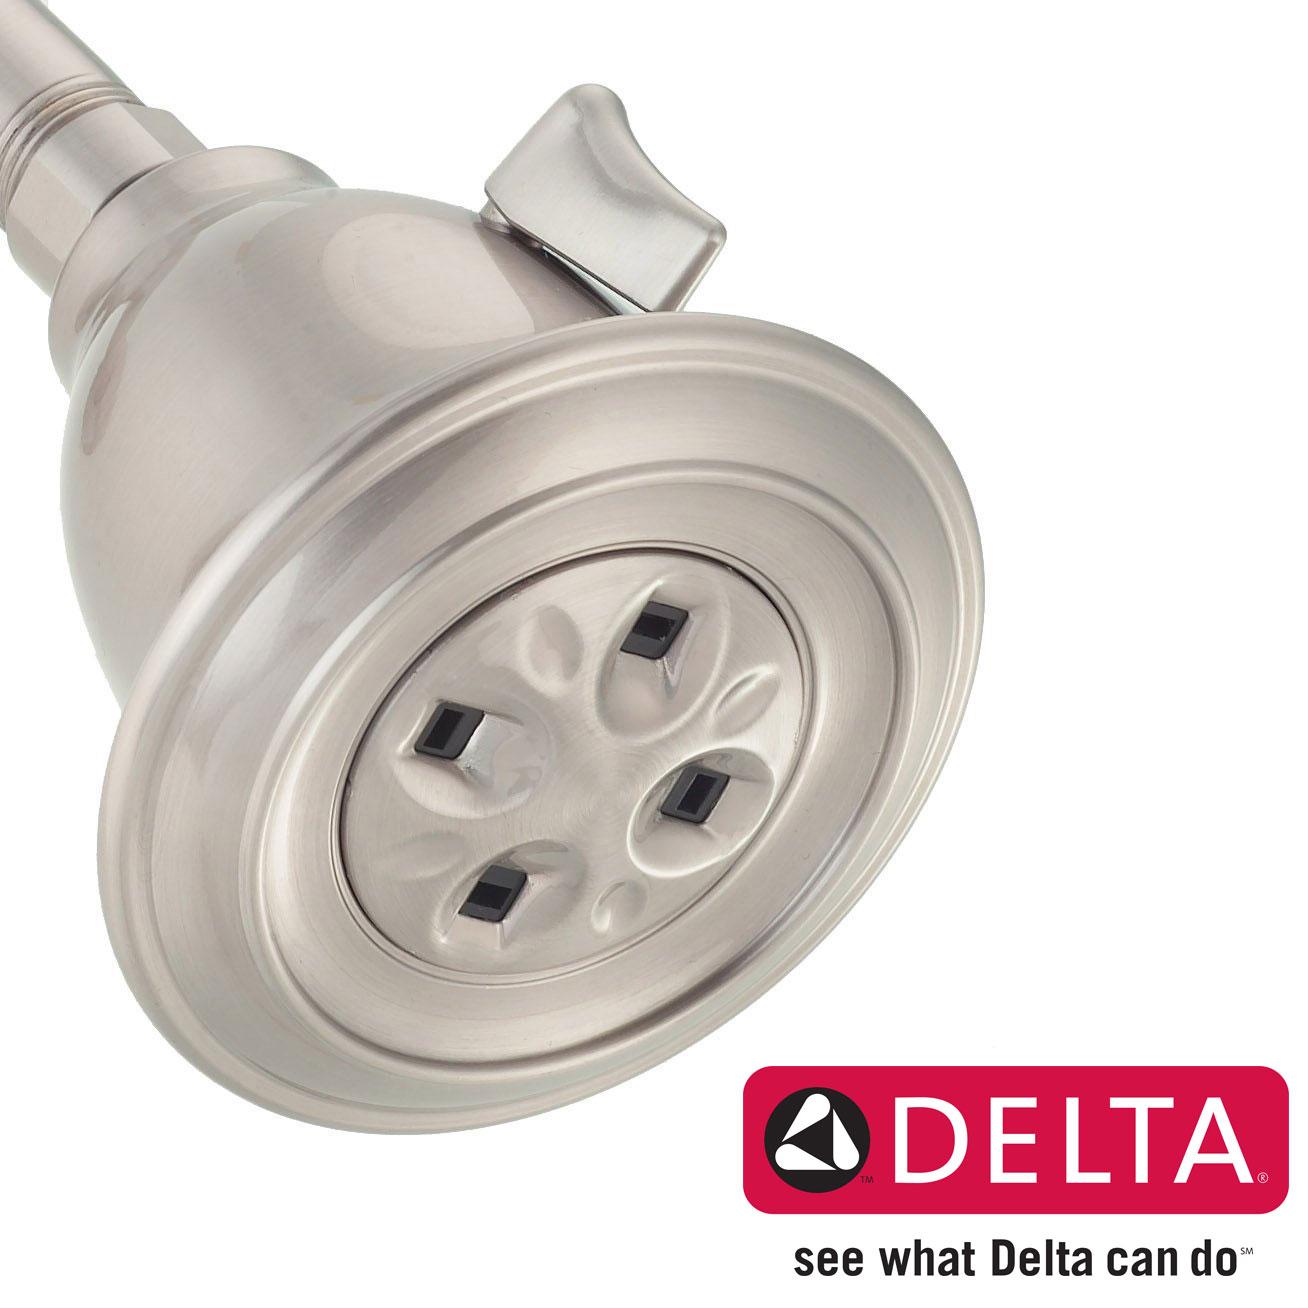 Delta-Adjustable-Water-Amplifying-Shower-Head-in-Satin-Nickel-Finish